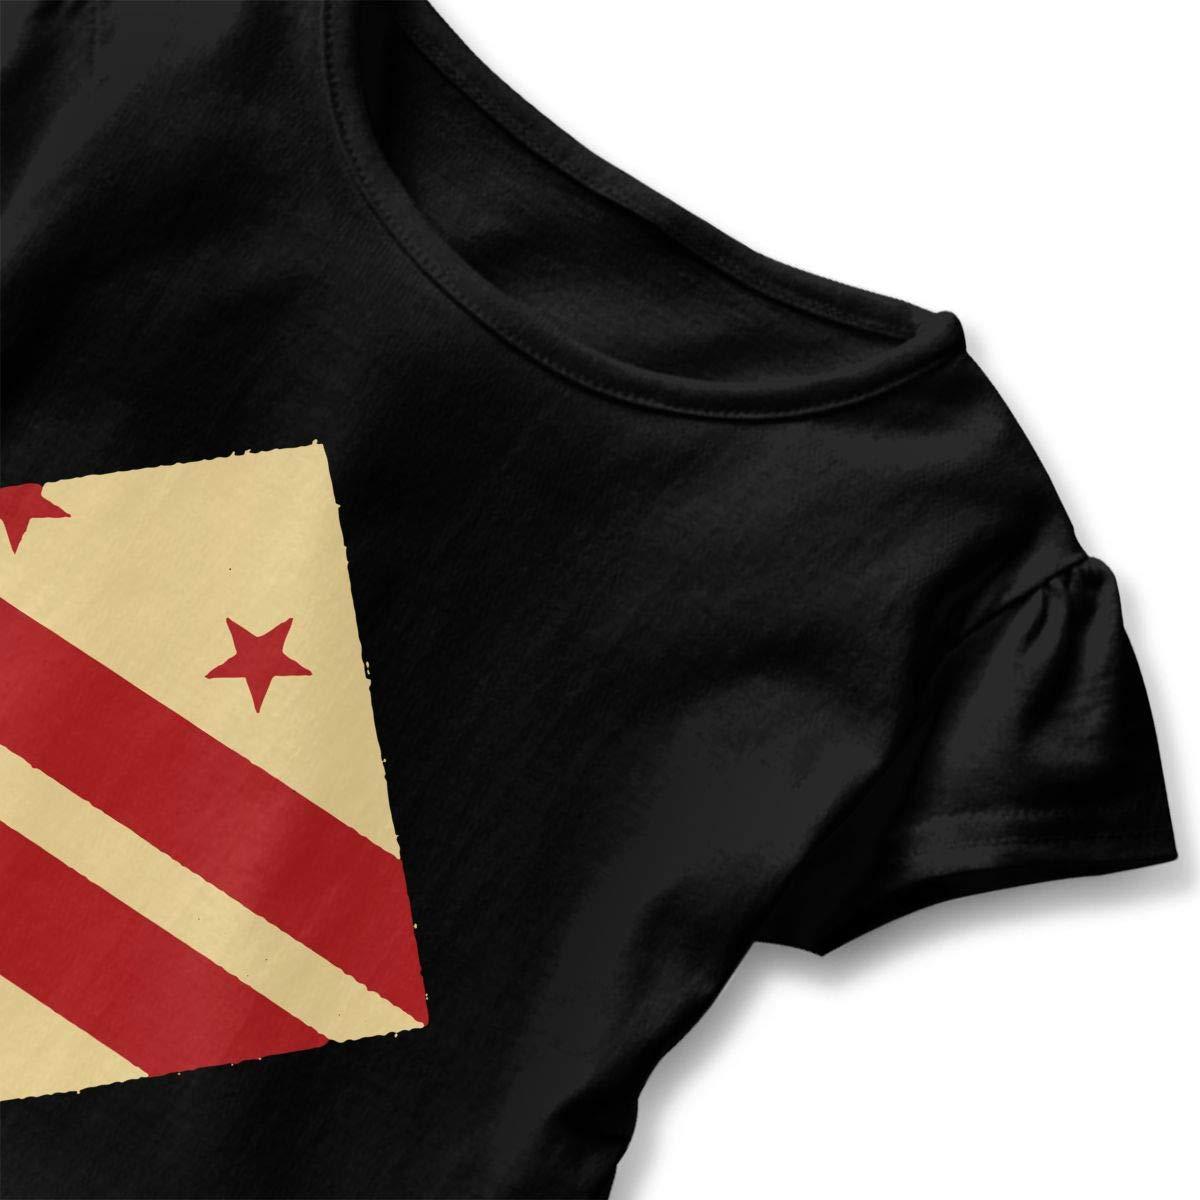 SHIRT1-KIDS Washington Flag Toddler//Infant Girls Short Sleeve Ruffles Shirt T-Shirt for 2-6 Toddlers